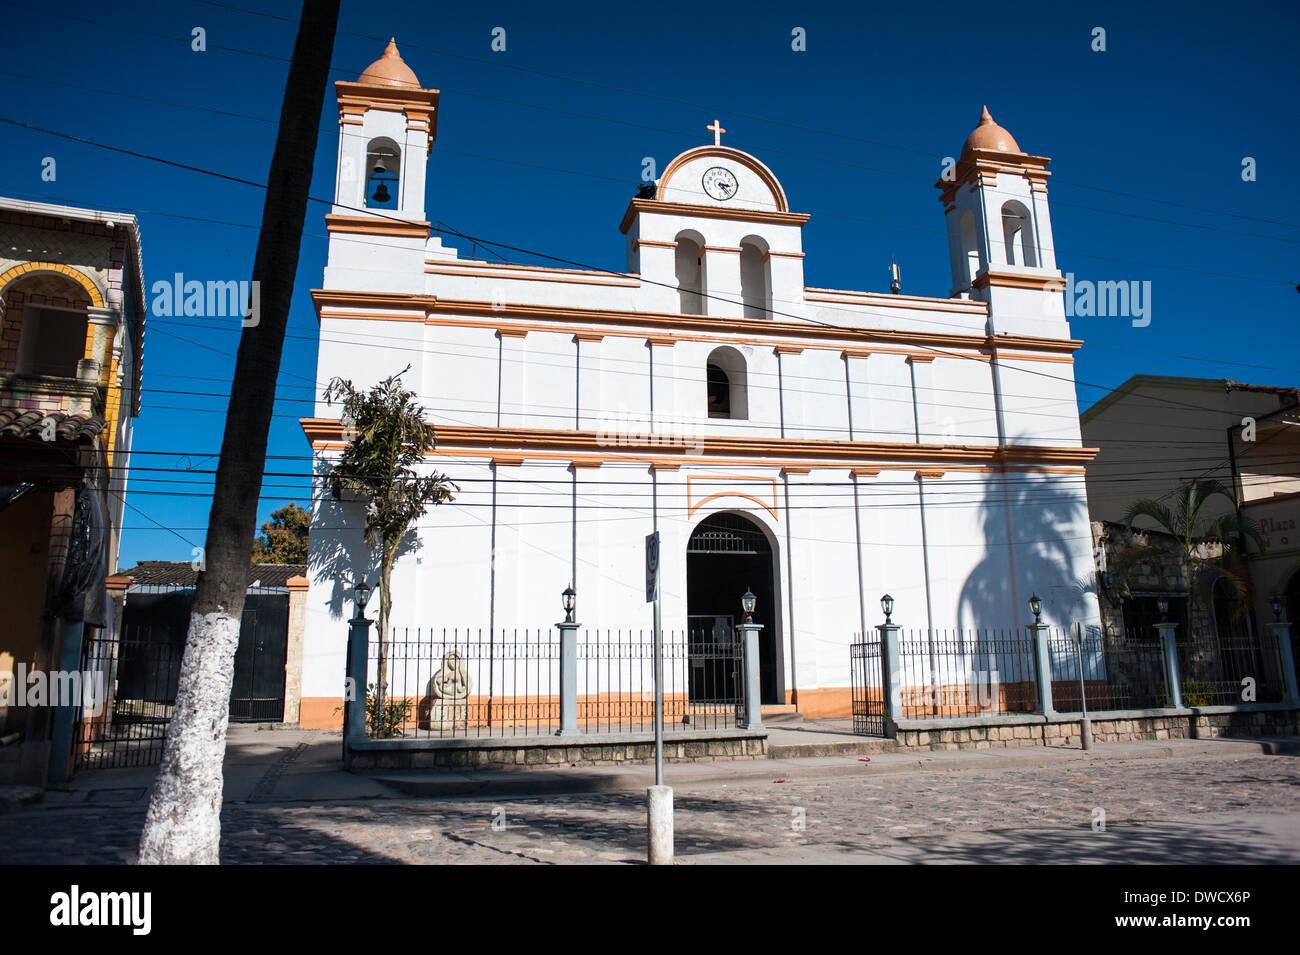 Iglesia Católica in the town of Copán Ruinas in Honduras - Stock Image